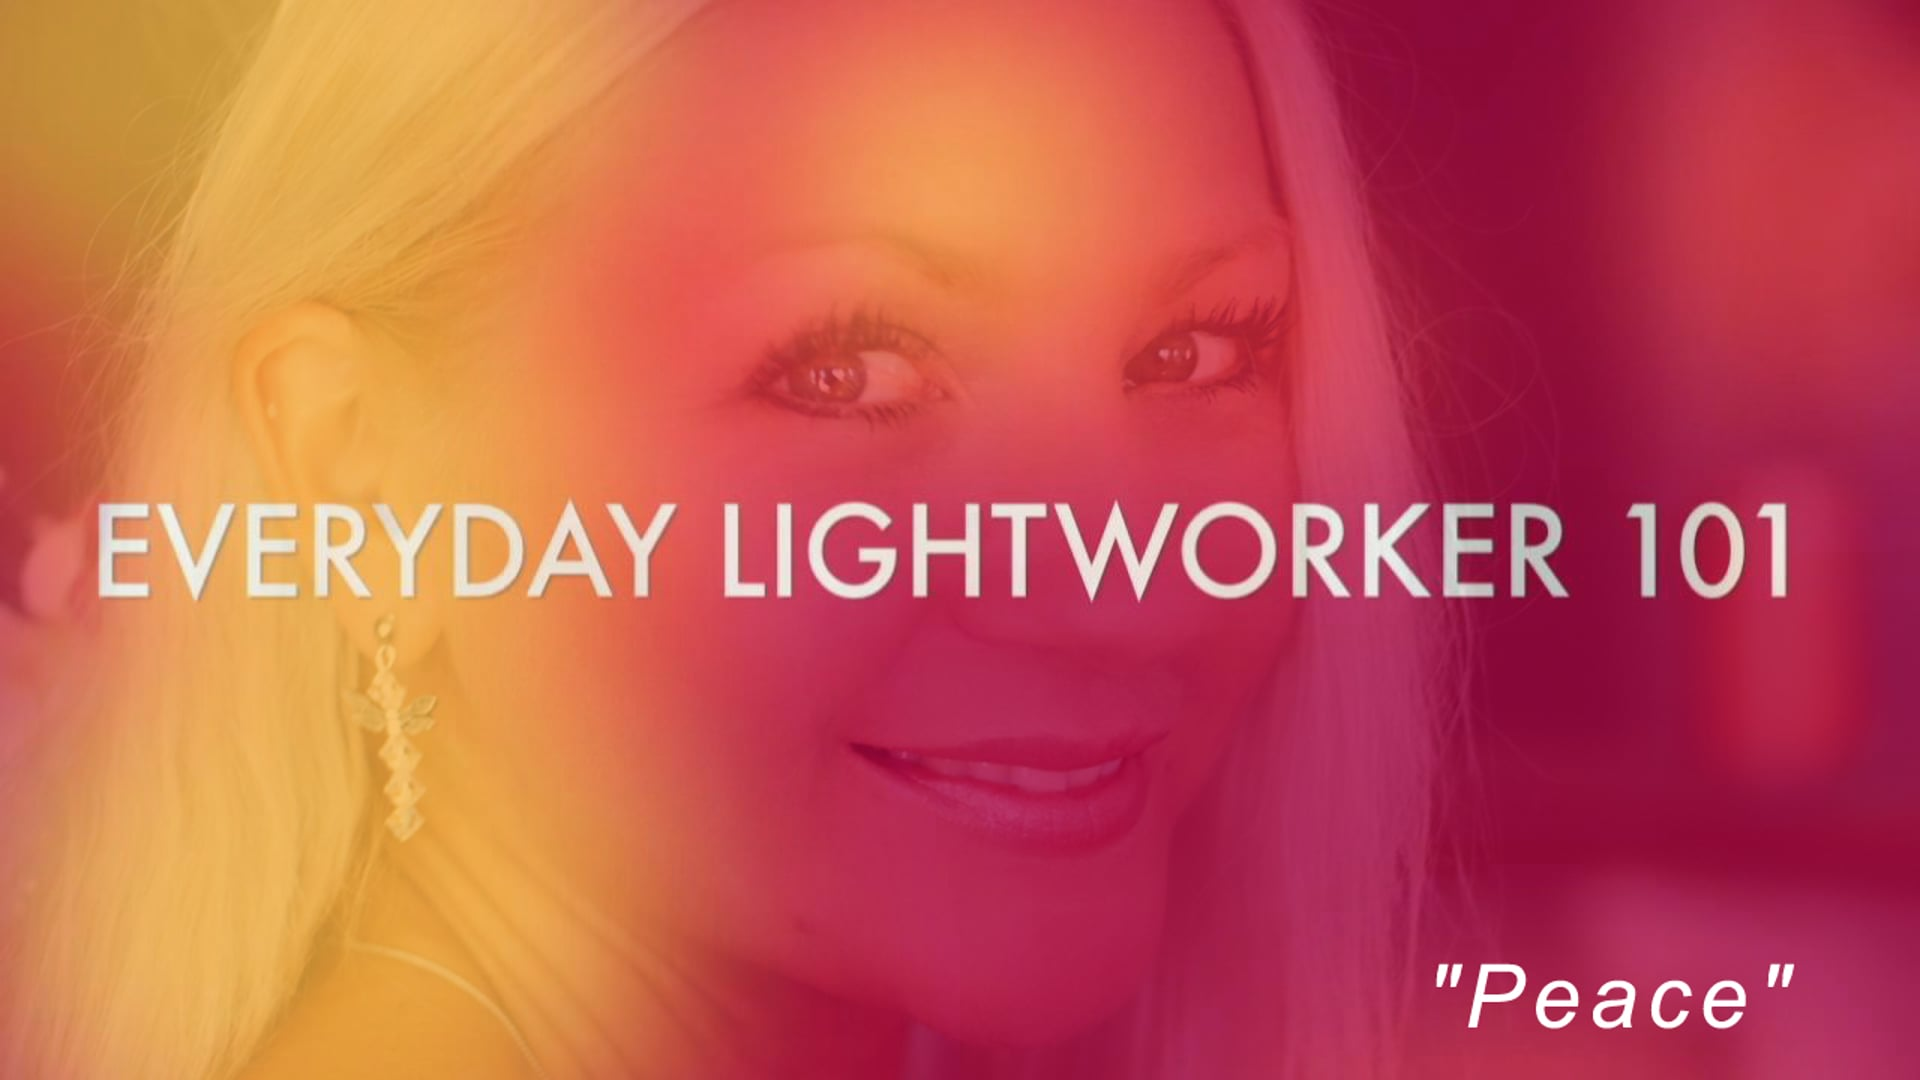 Everyday Lightworker 101: Peace